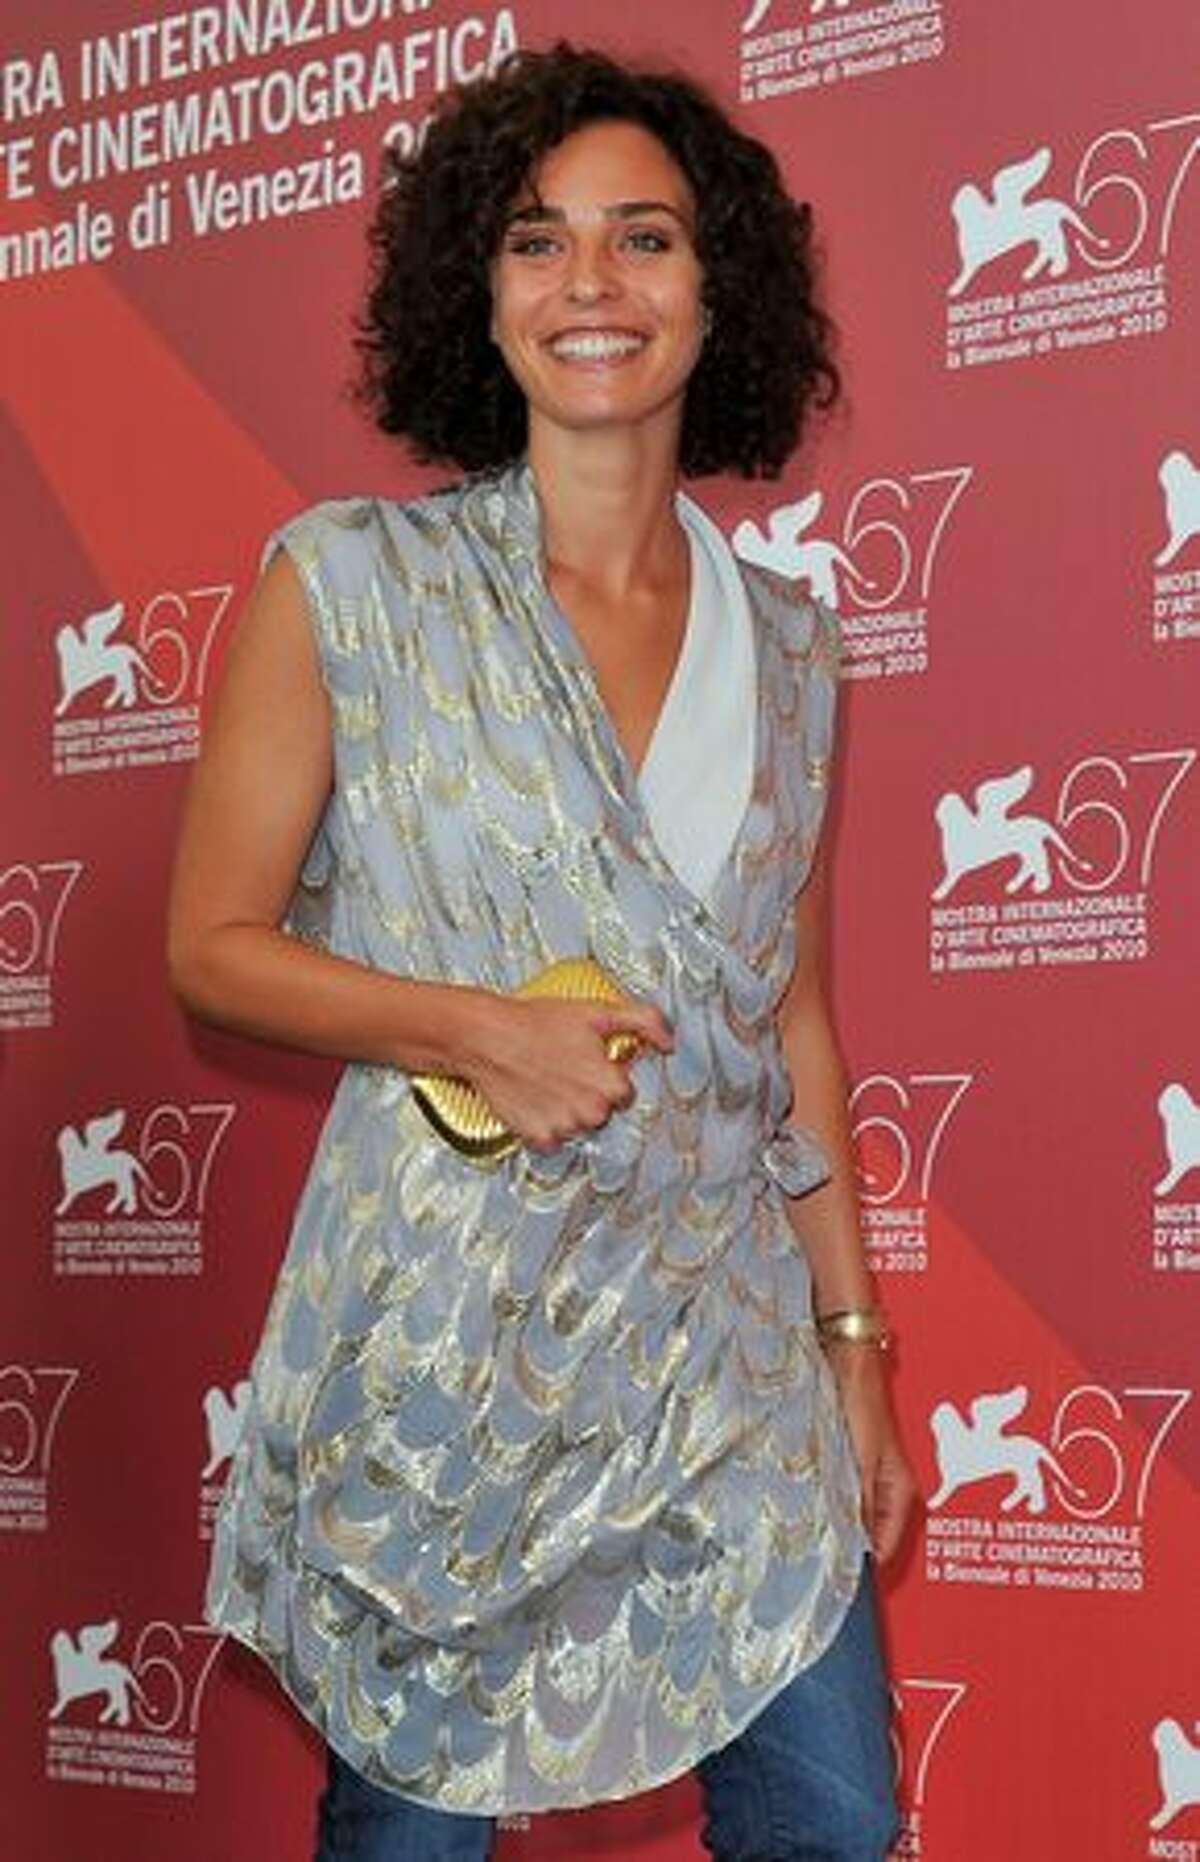 Actress Valentina Bardi attends the